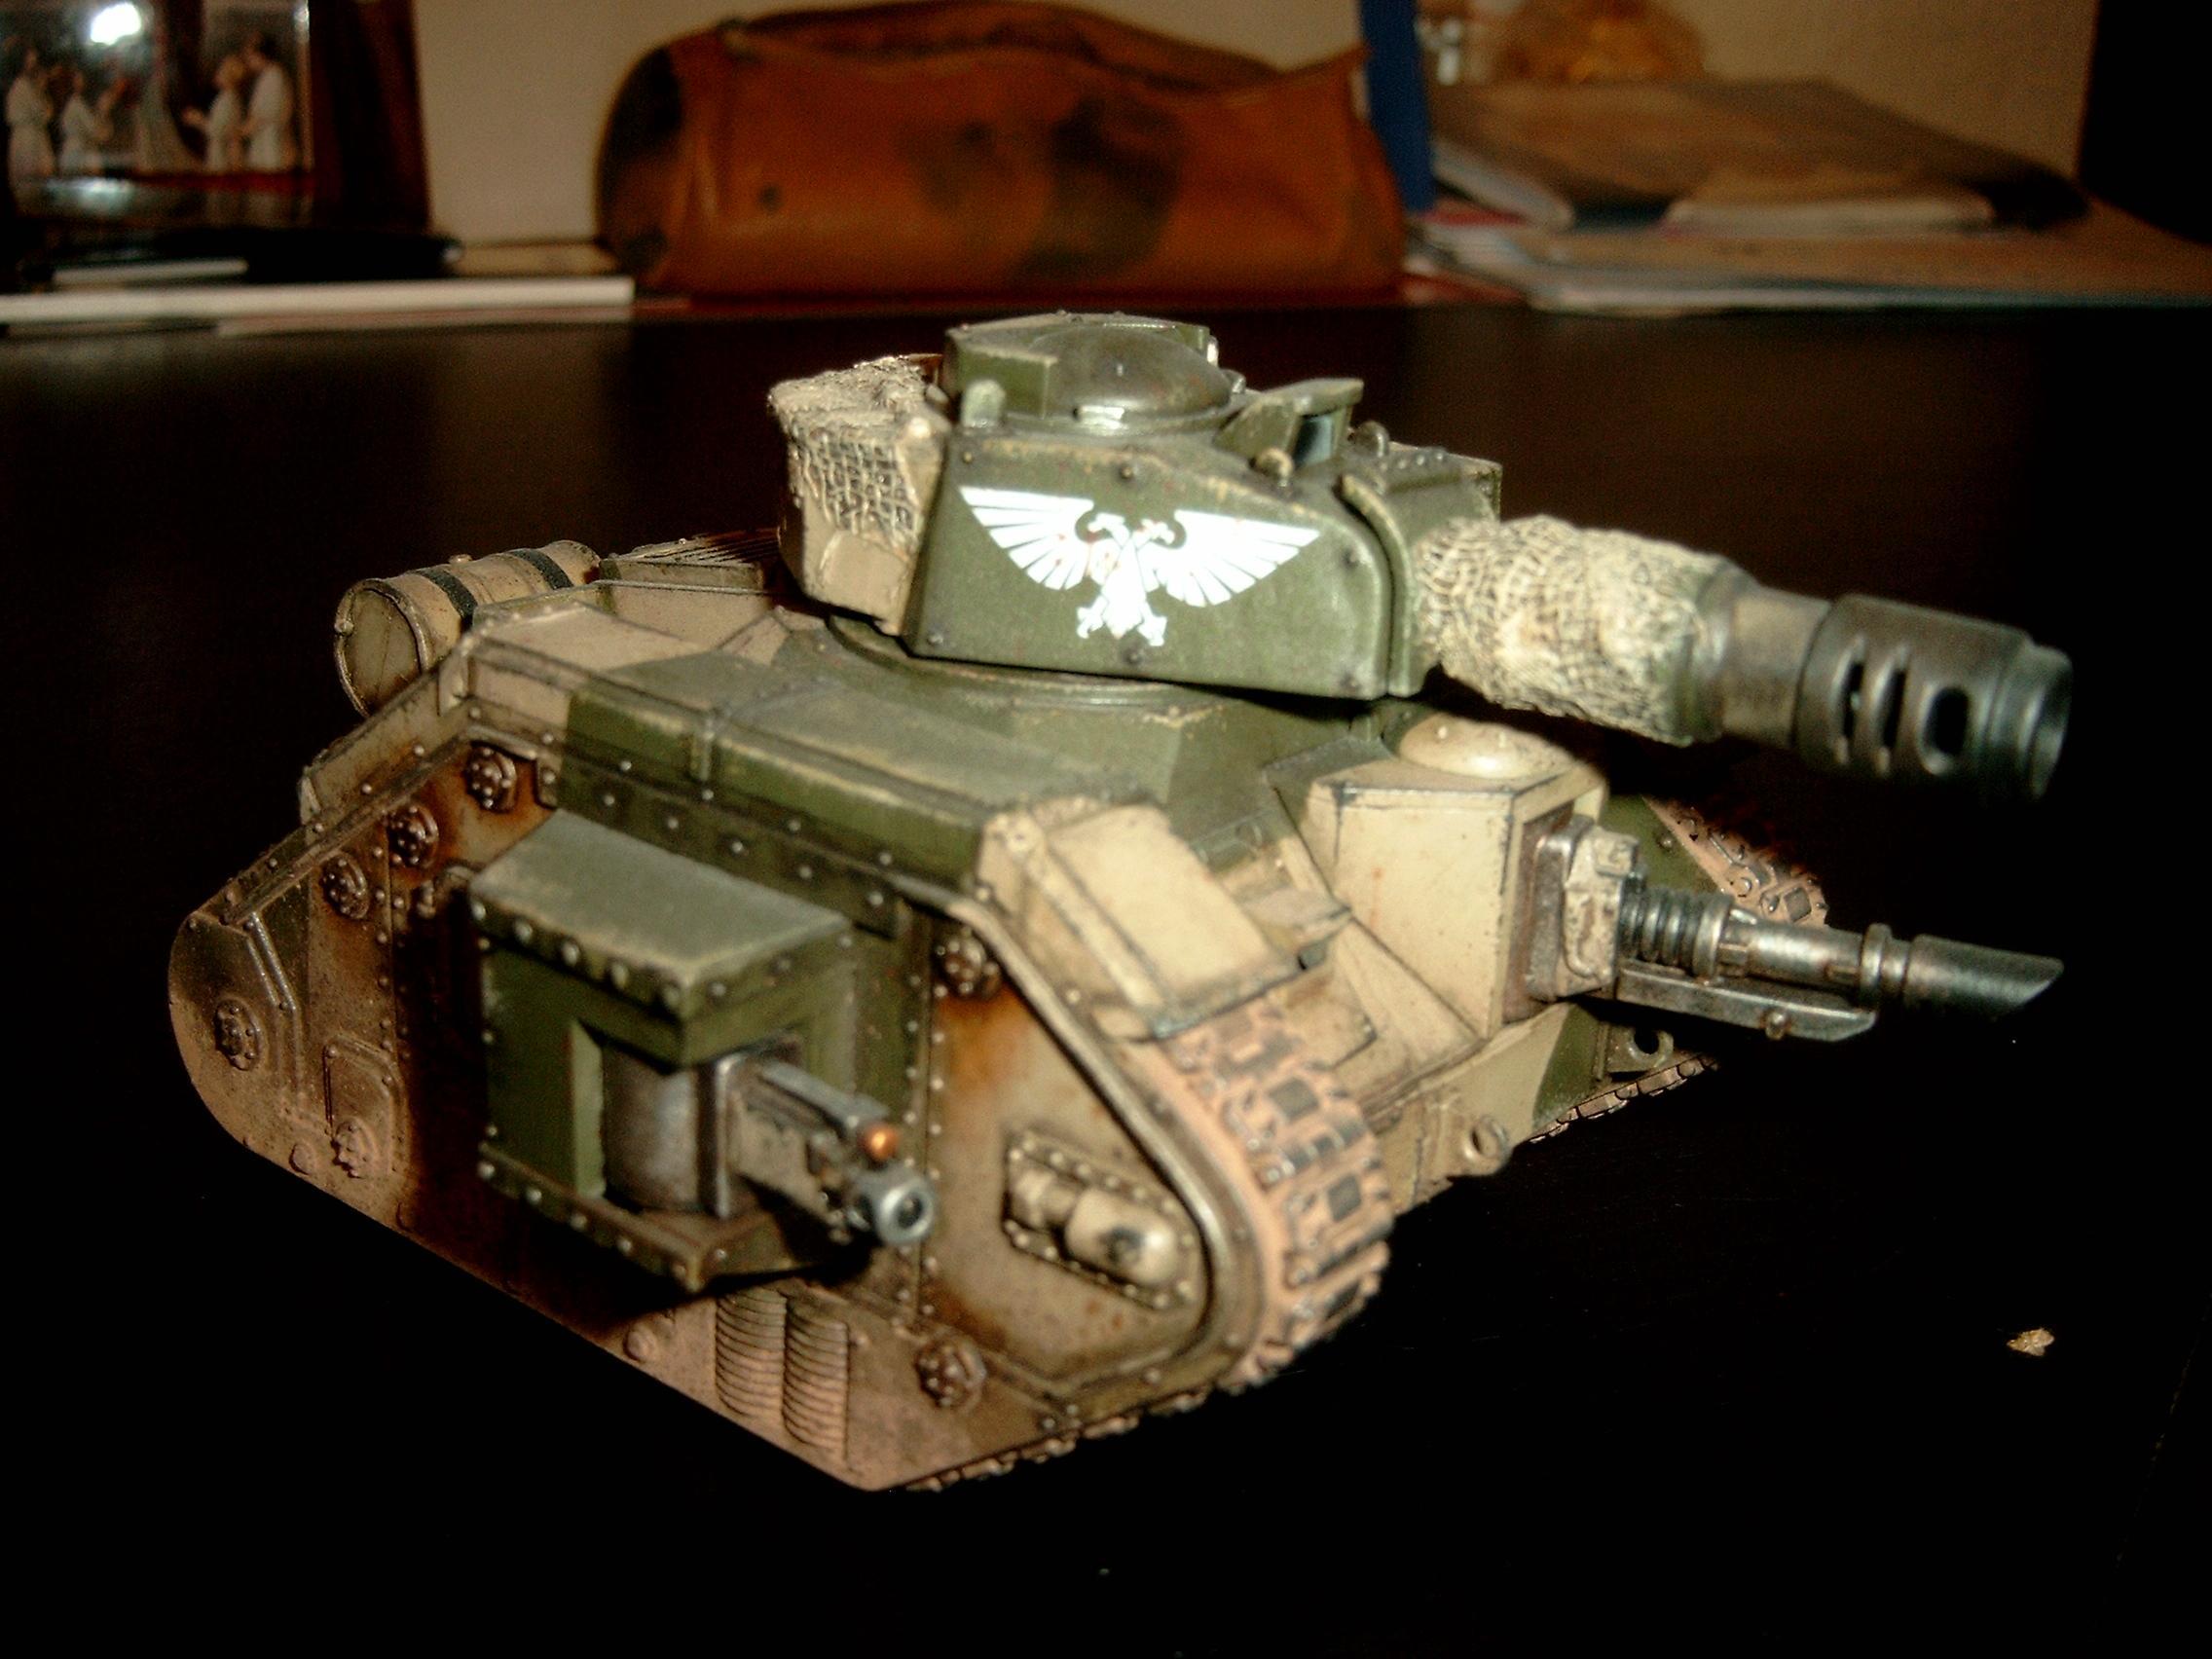 8th, Battle Tank, Cadians, Imperial Guard, Leman Russ, Tank, Warhammer 40,000